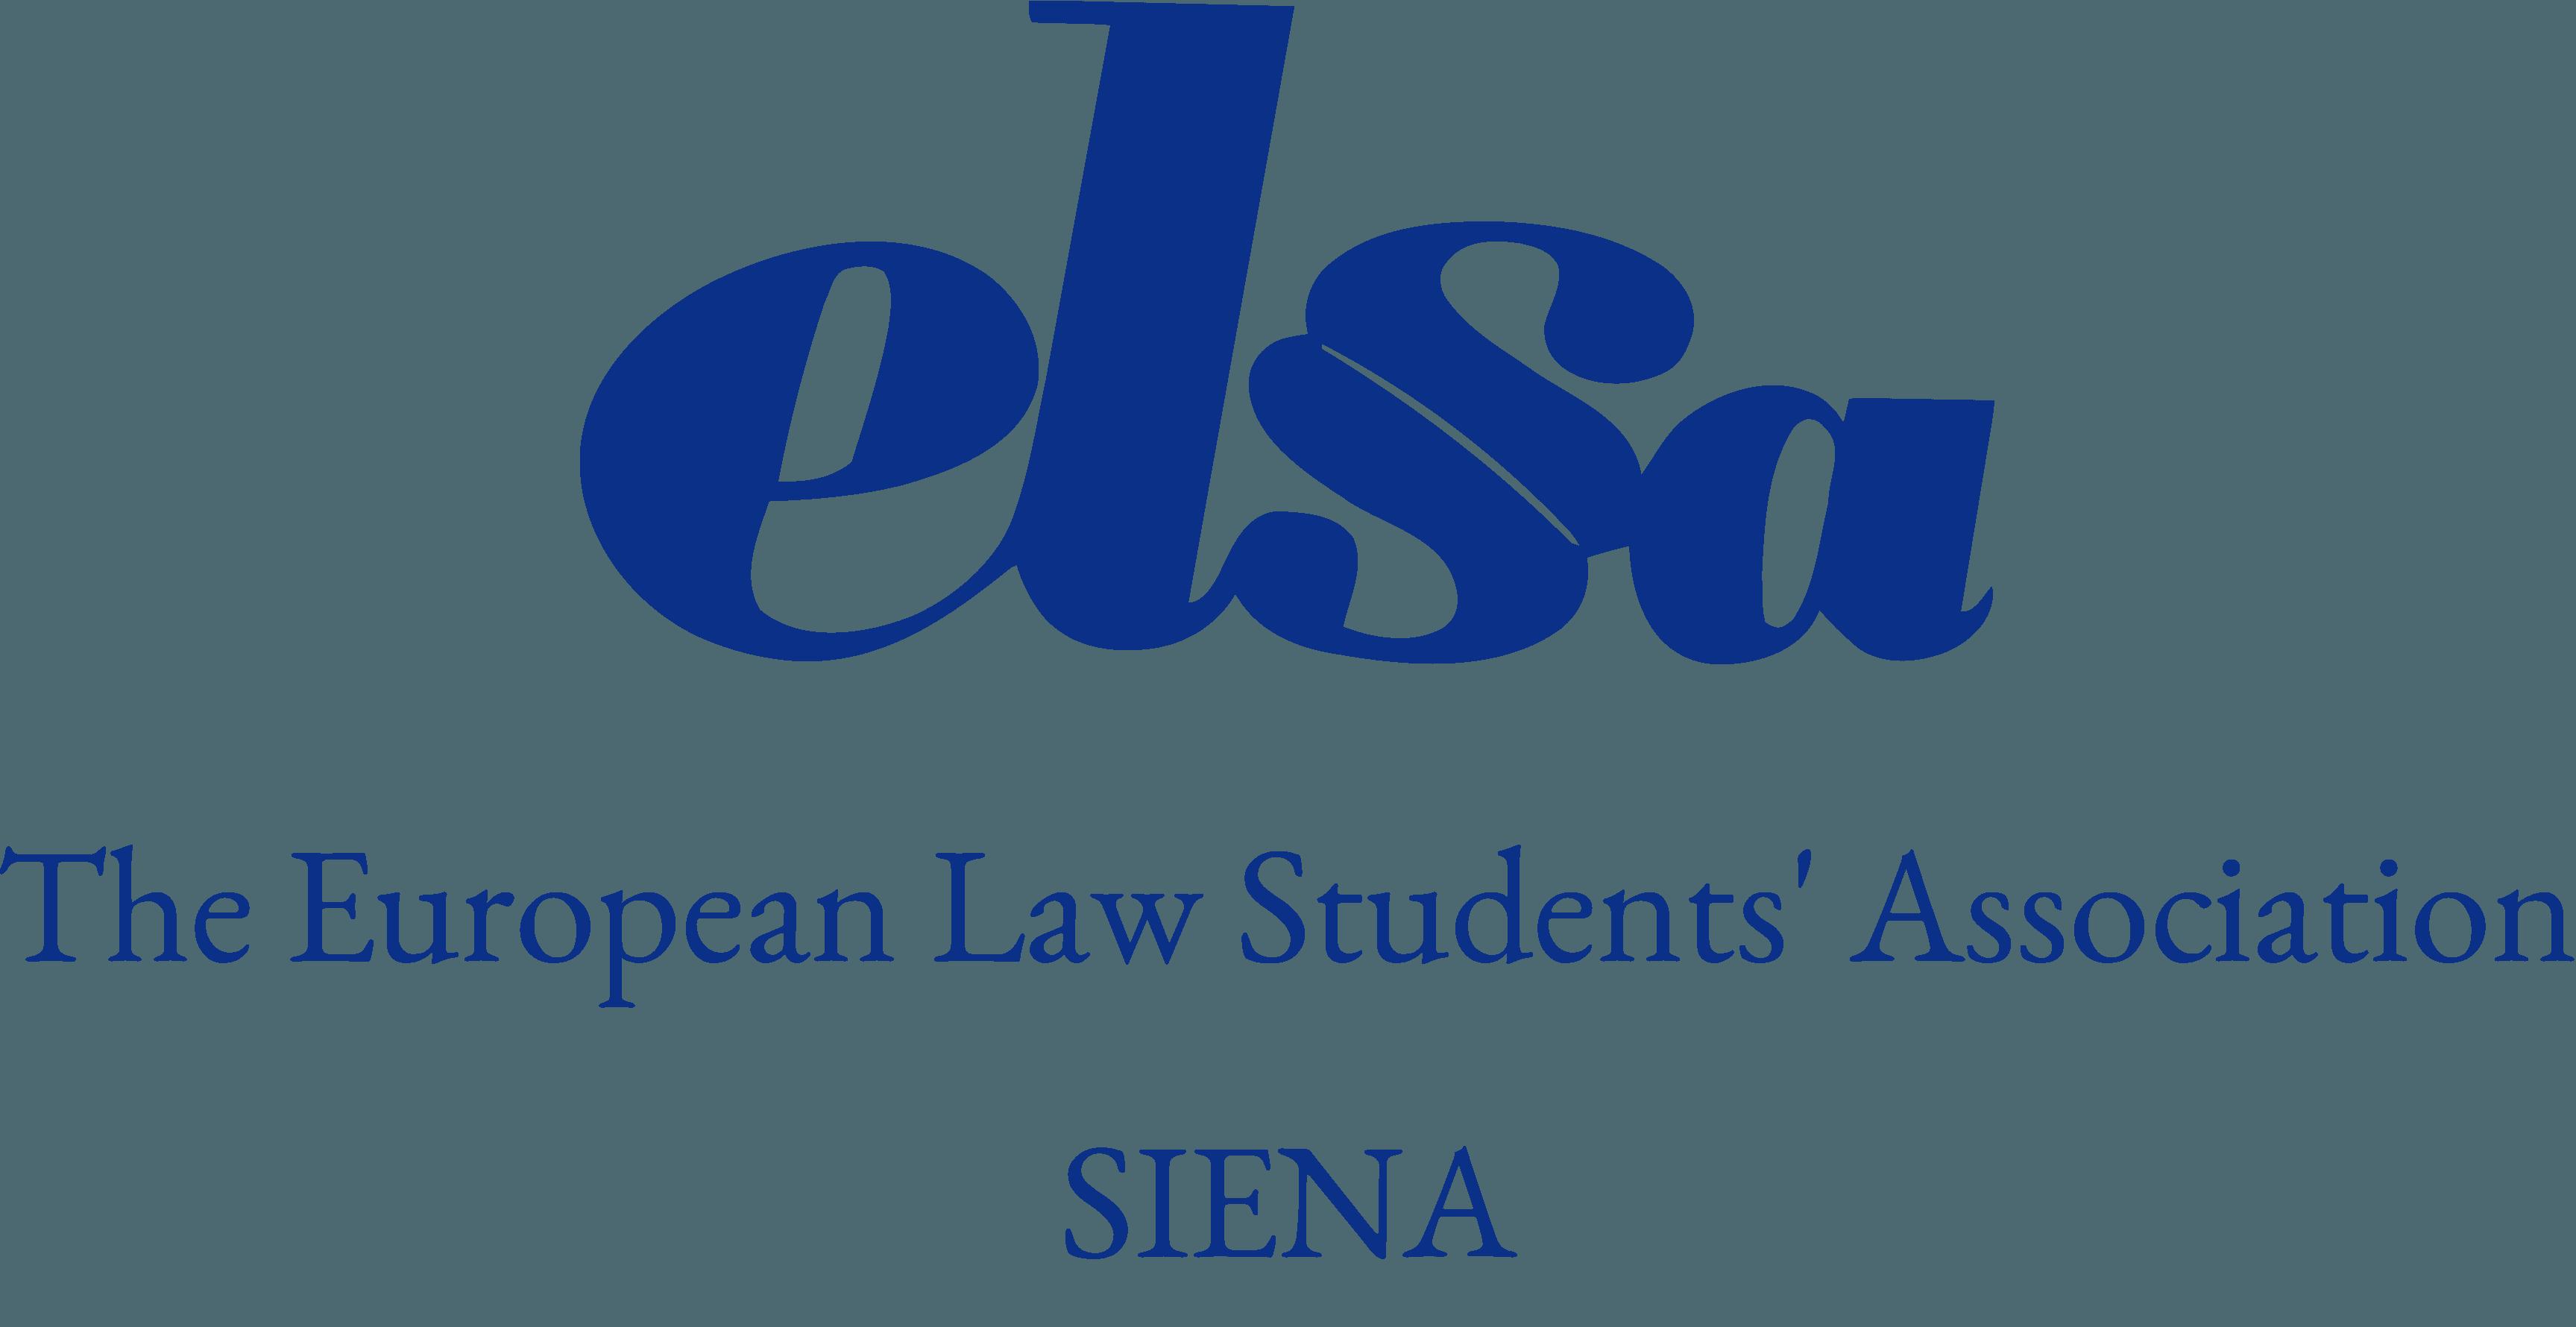 ELSA Siena